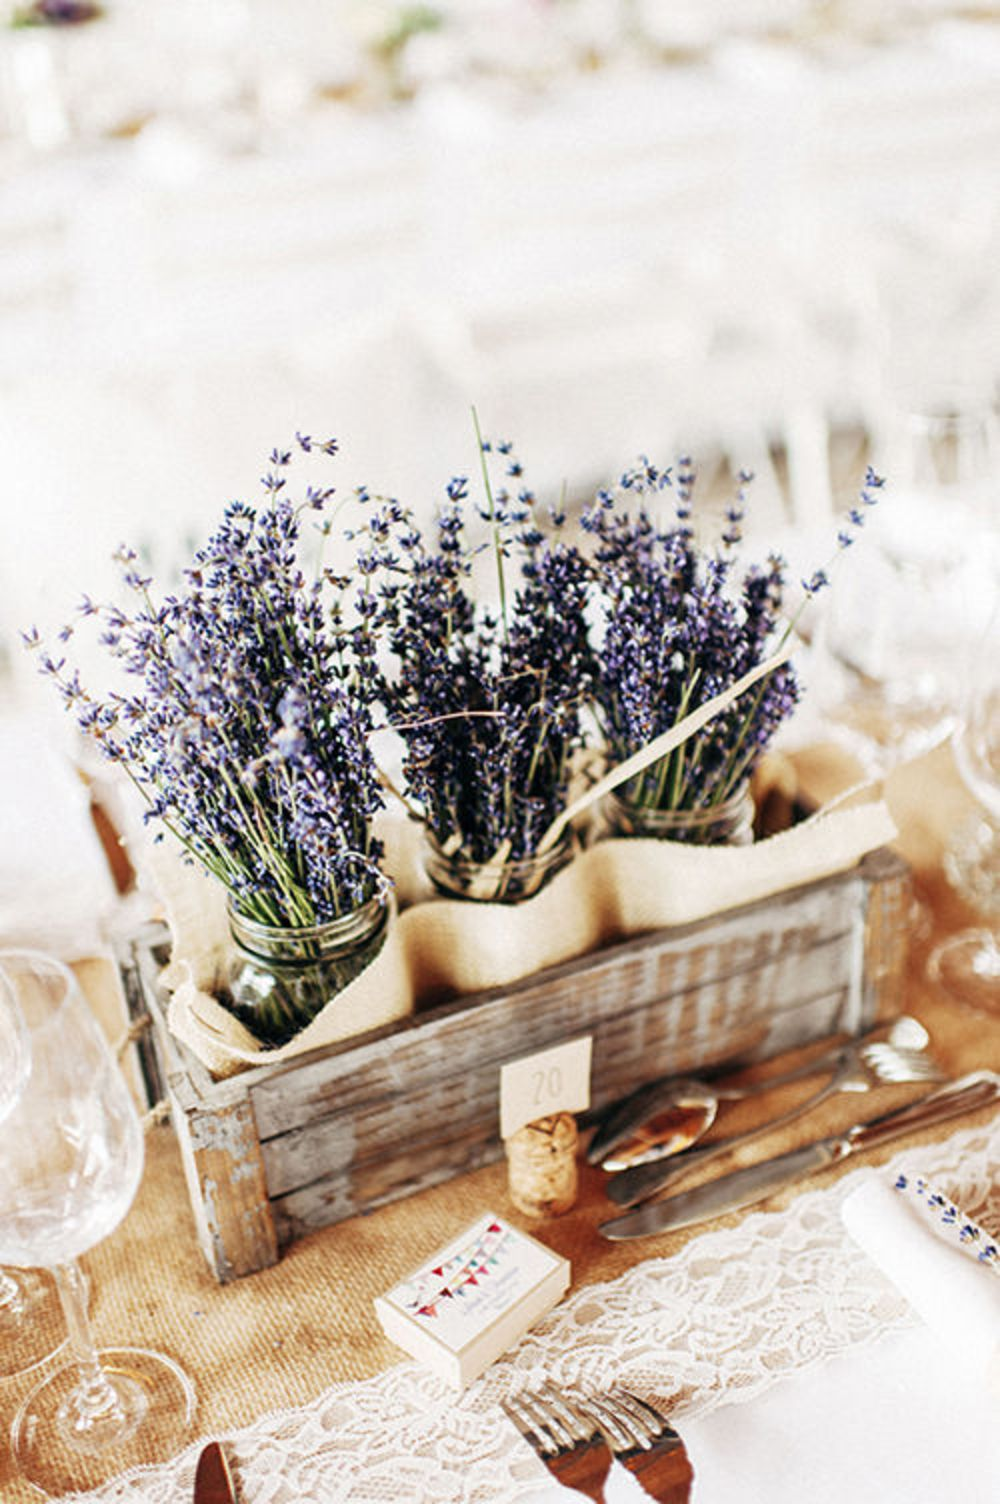 Lavender decor for wedding creative summer centerpiece ideas  Summer centerpieces and Centerpieces